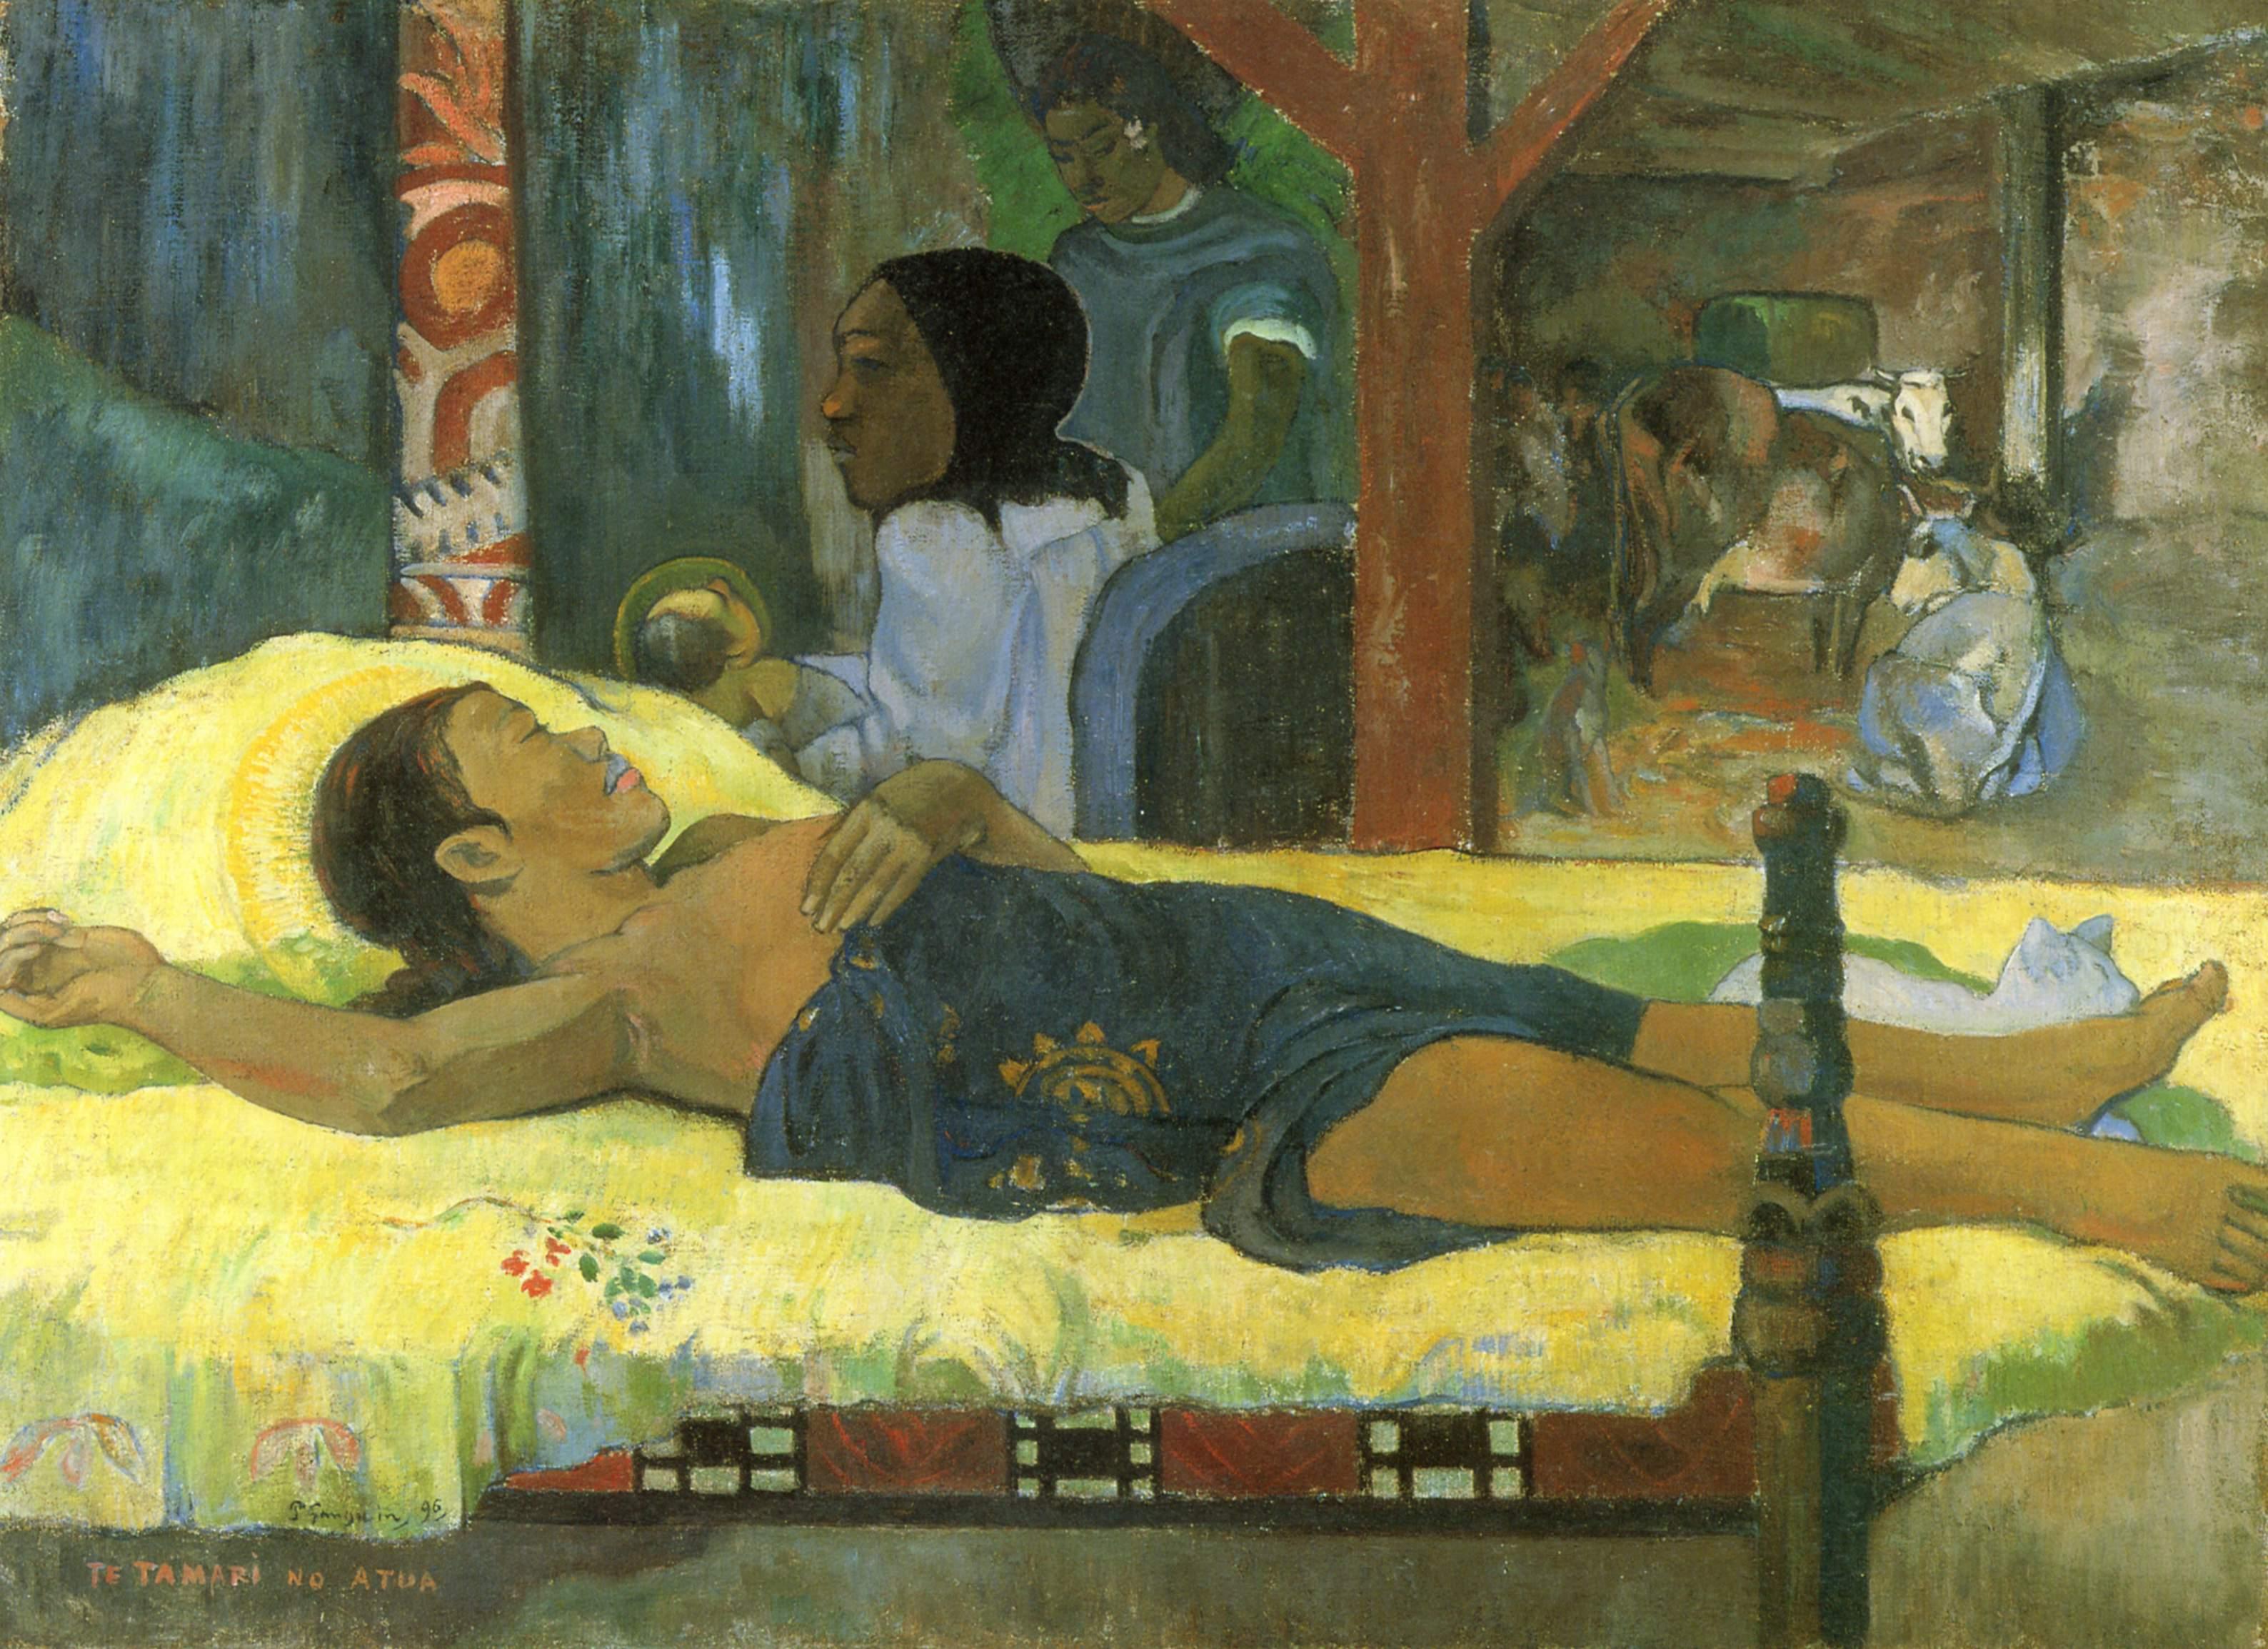 File:Paul Gauguin 062.jpg - Wikimedia Commons